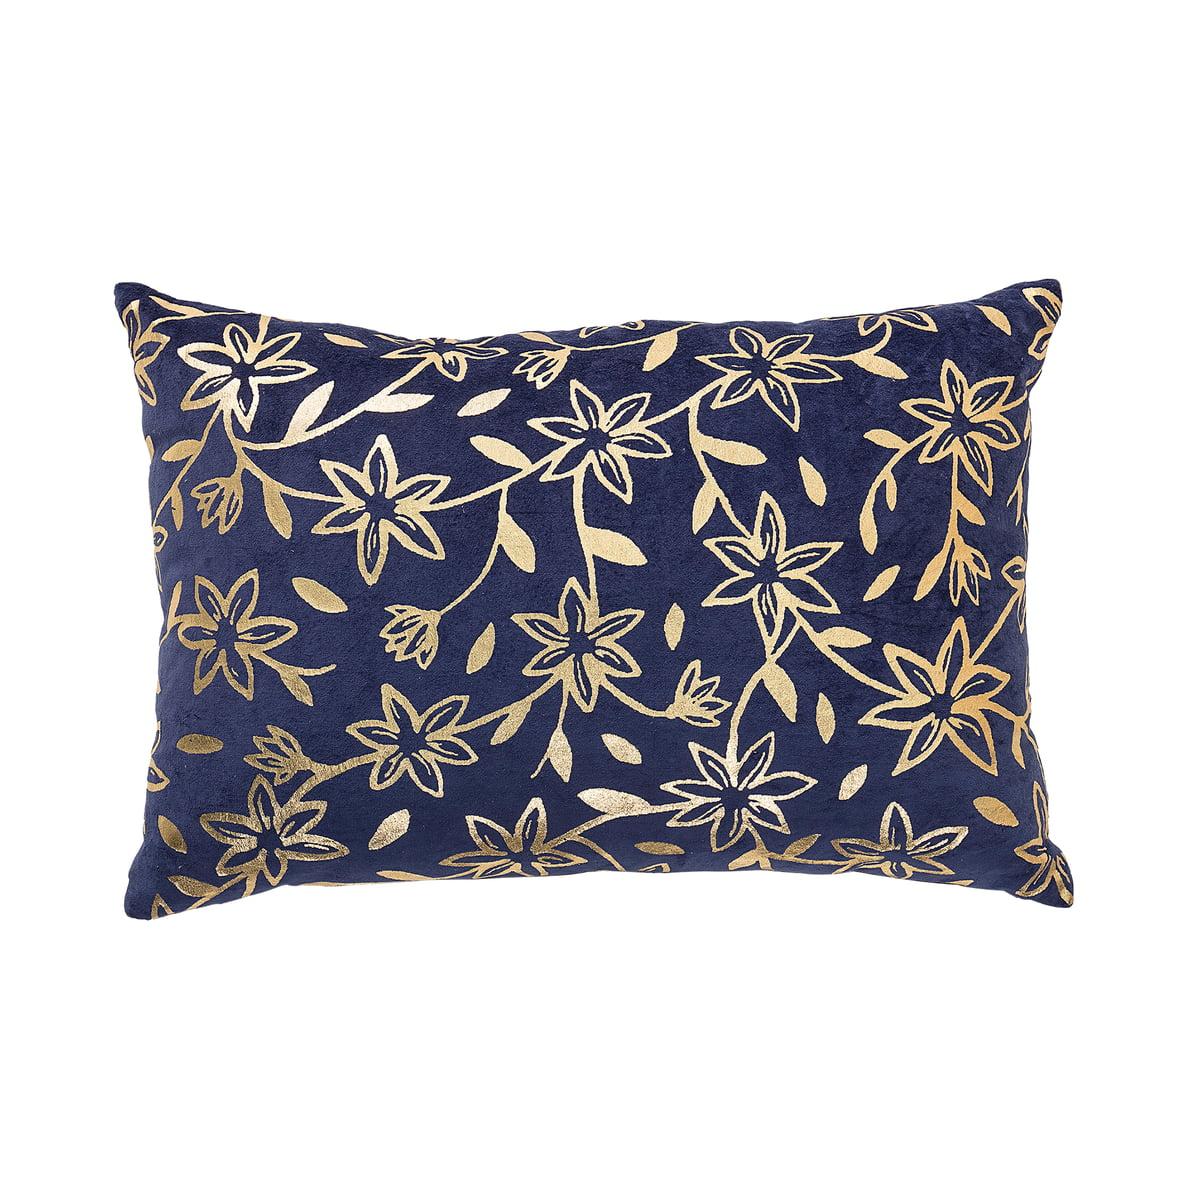 kissen mit golddruck von bloomingville. Black Bedroom Furniture Sets. Home Design Ideas